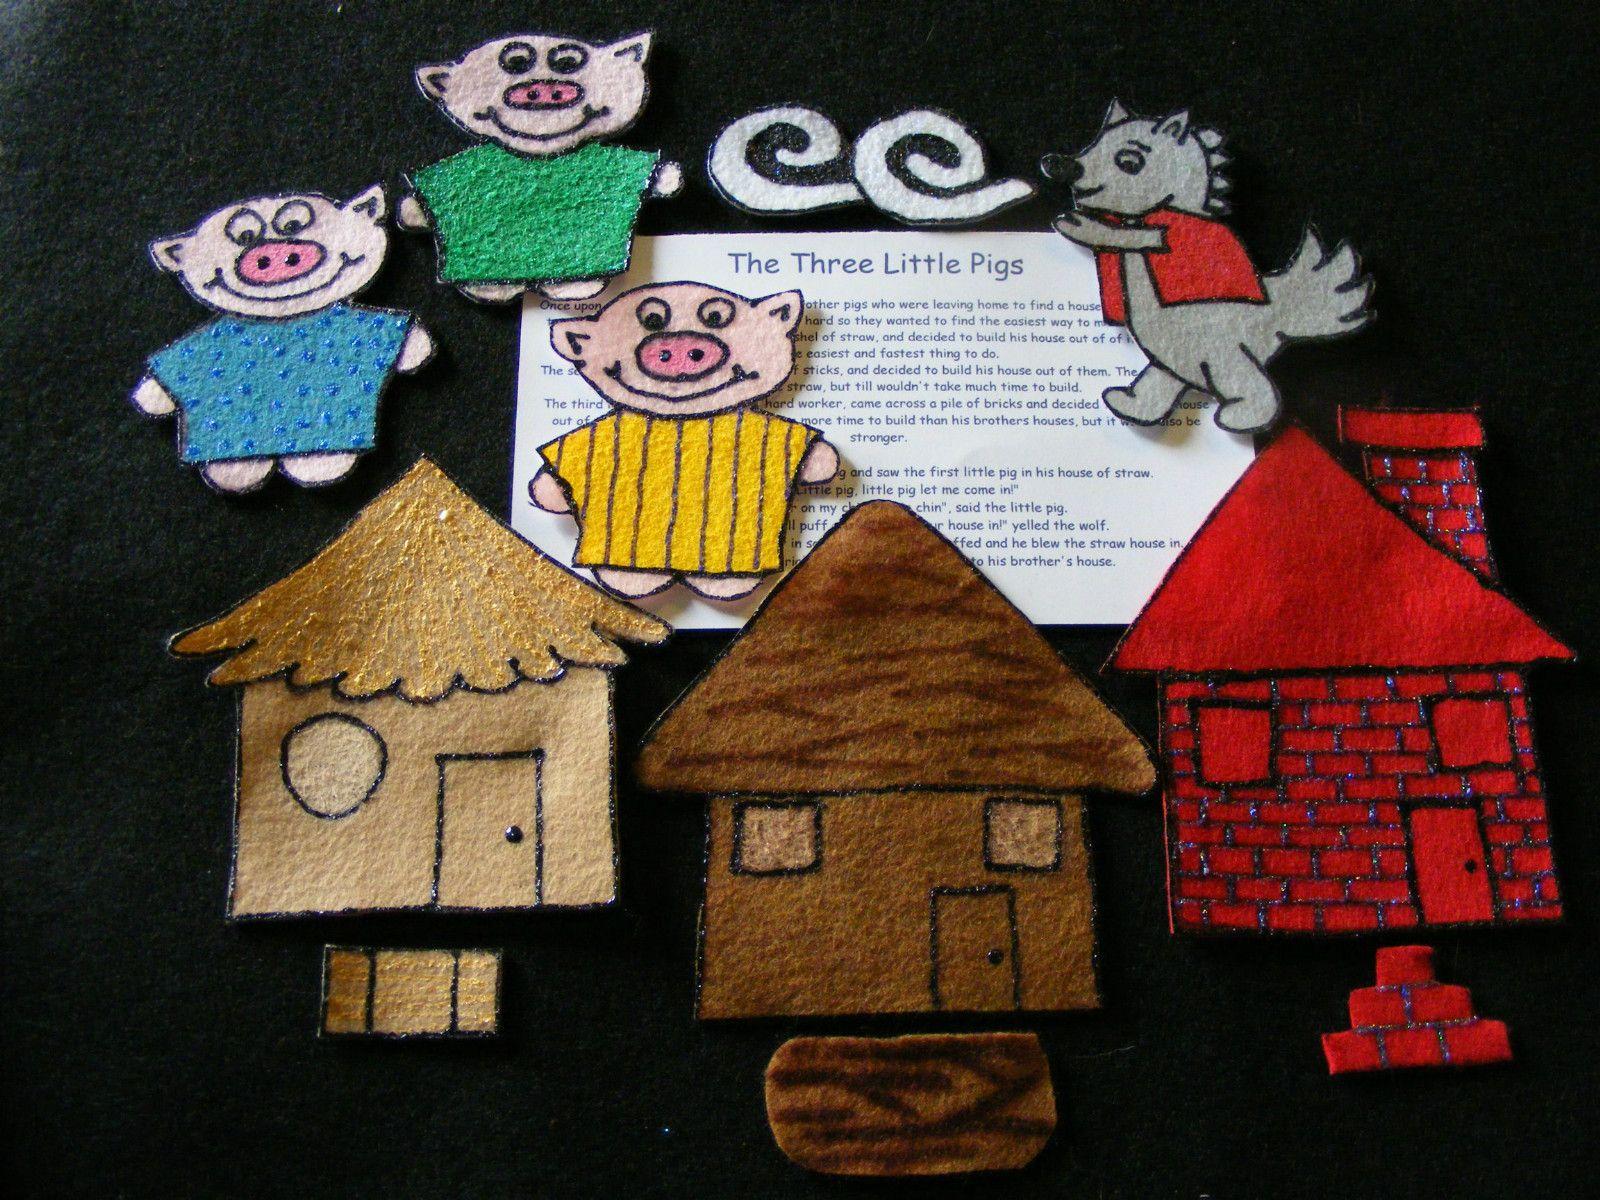 The Three 3 Little Pigs